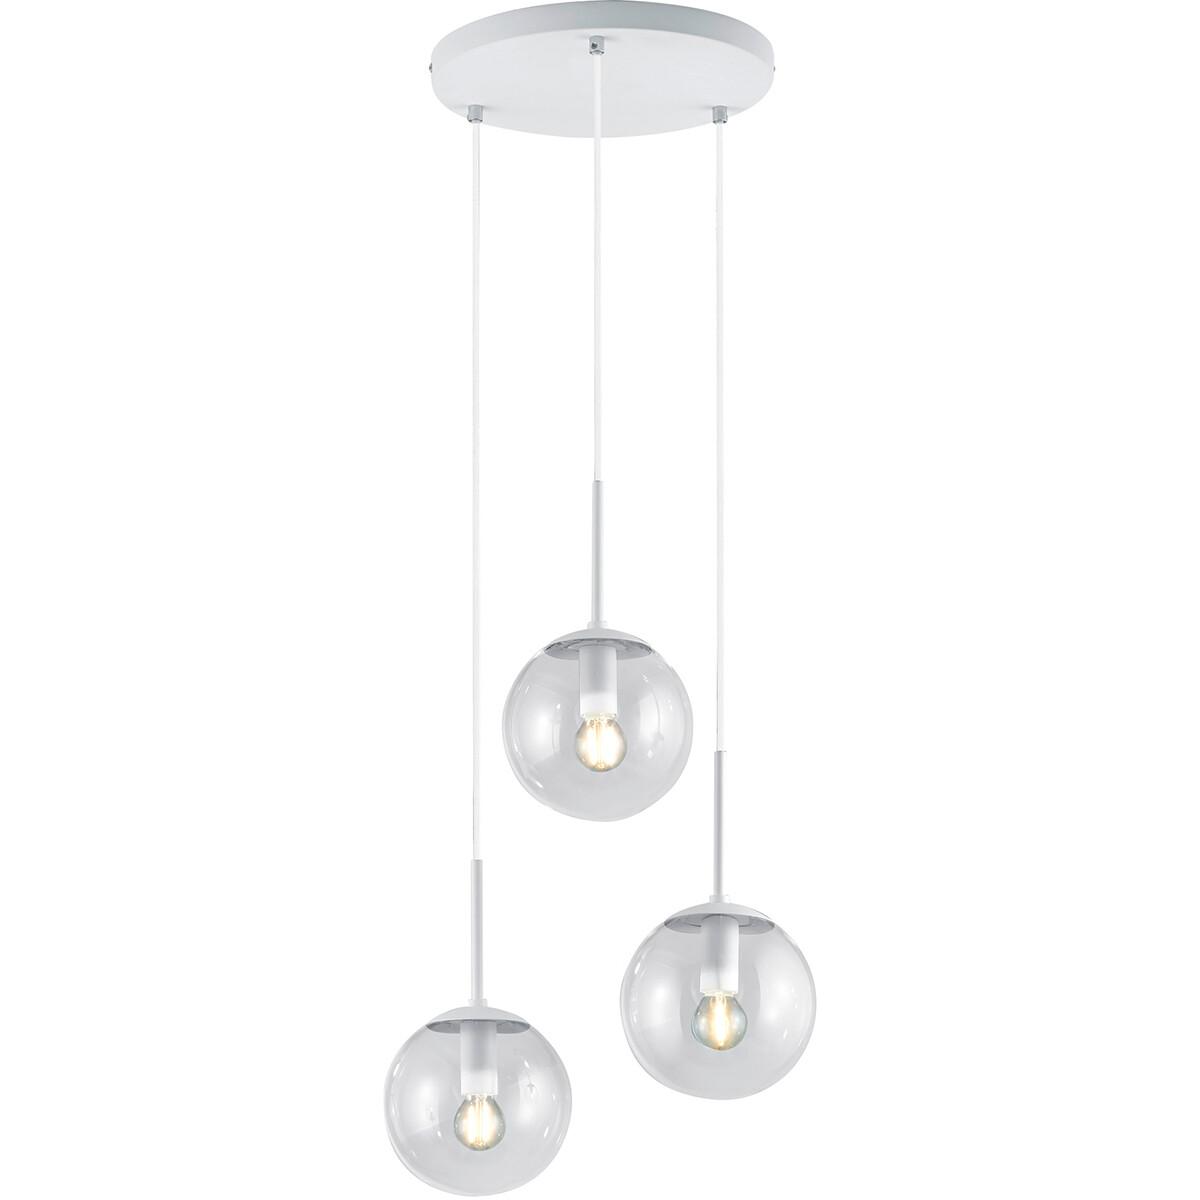 LED Hanglamp - Trion Balina - E14 Fitting - 3-lichts - Rond - Mat Wit - Aluminium